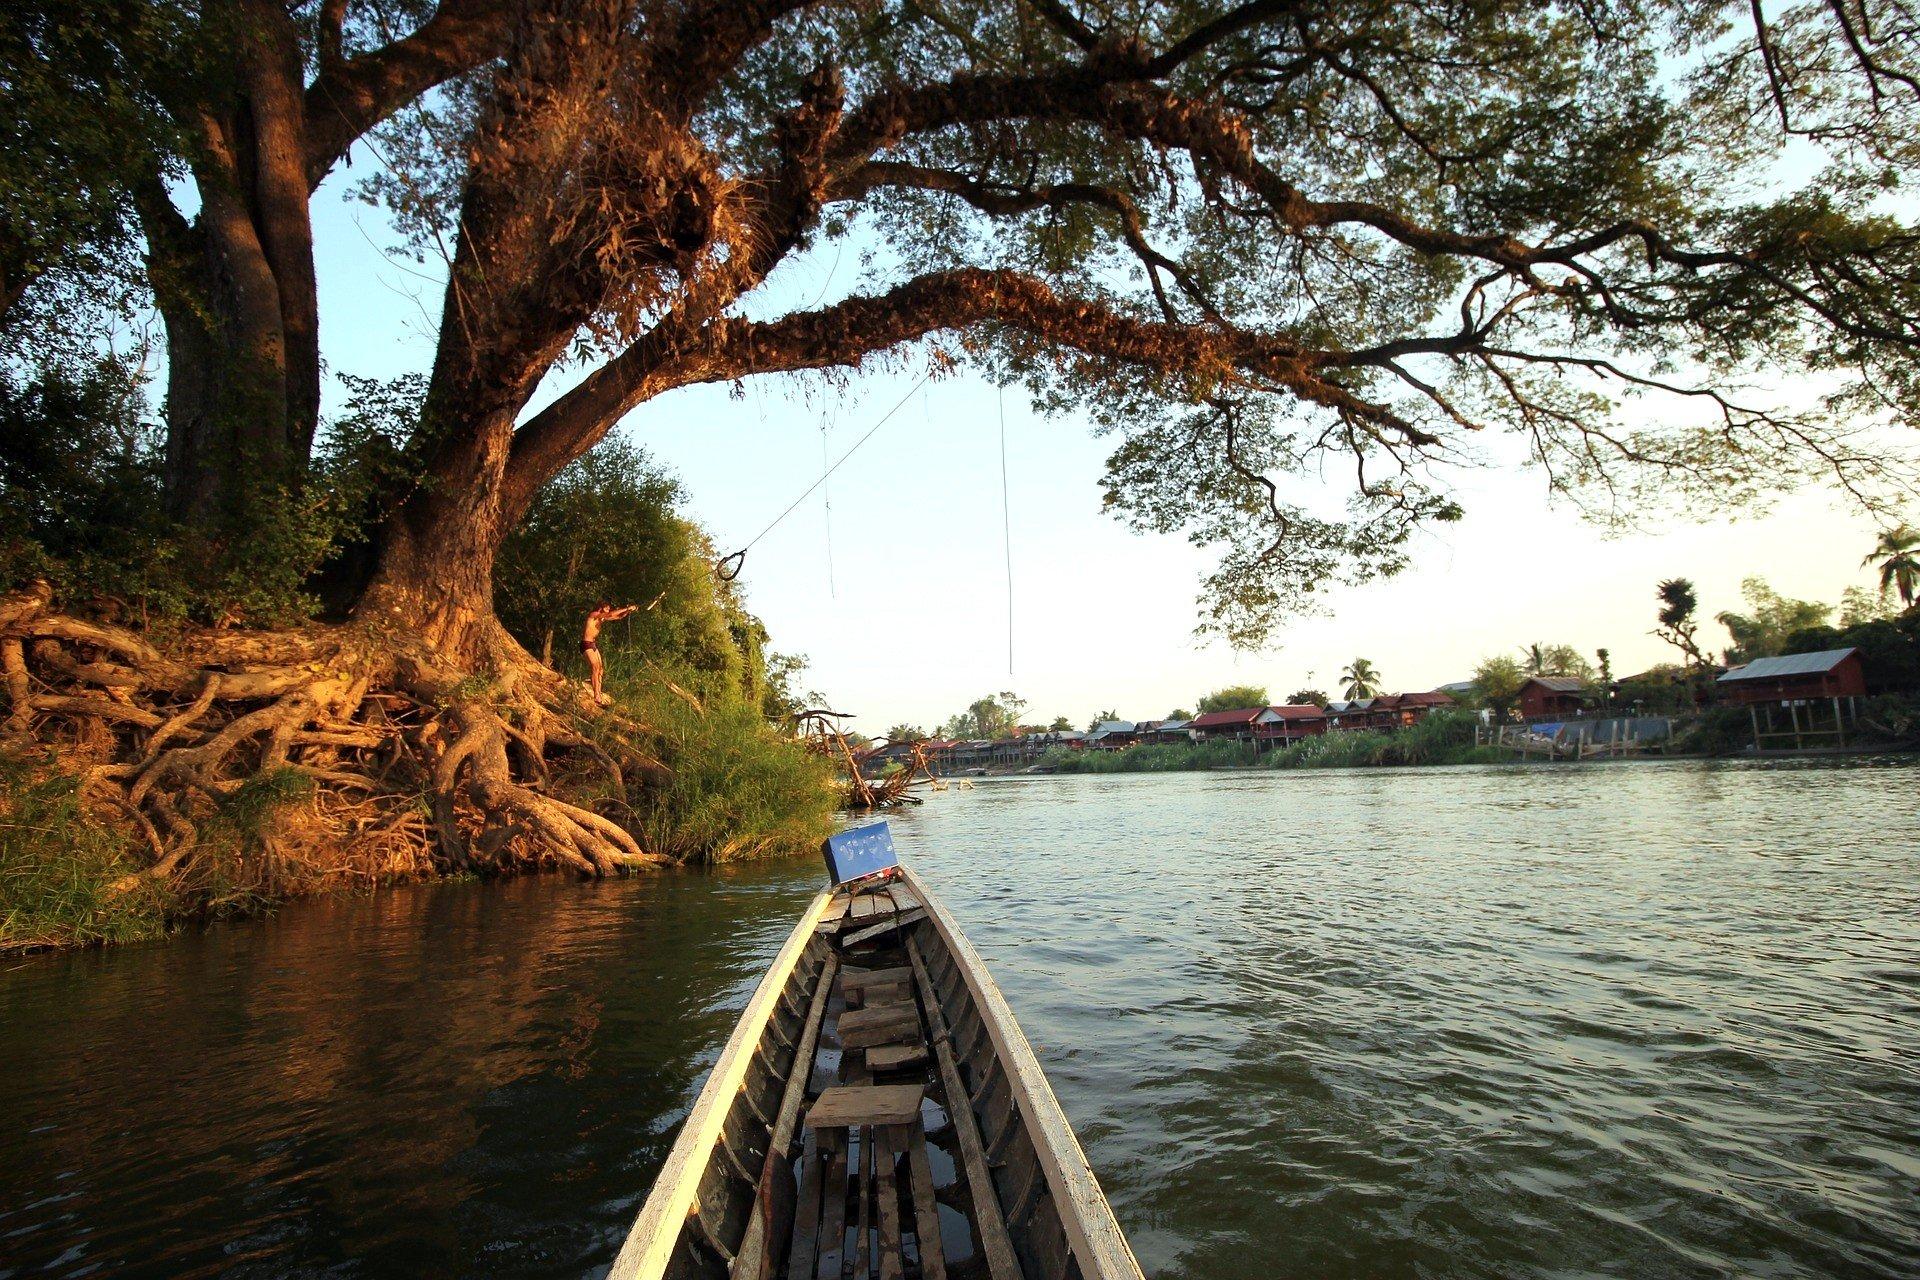 Mekong River around Don Det